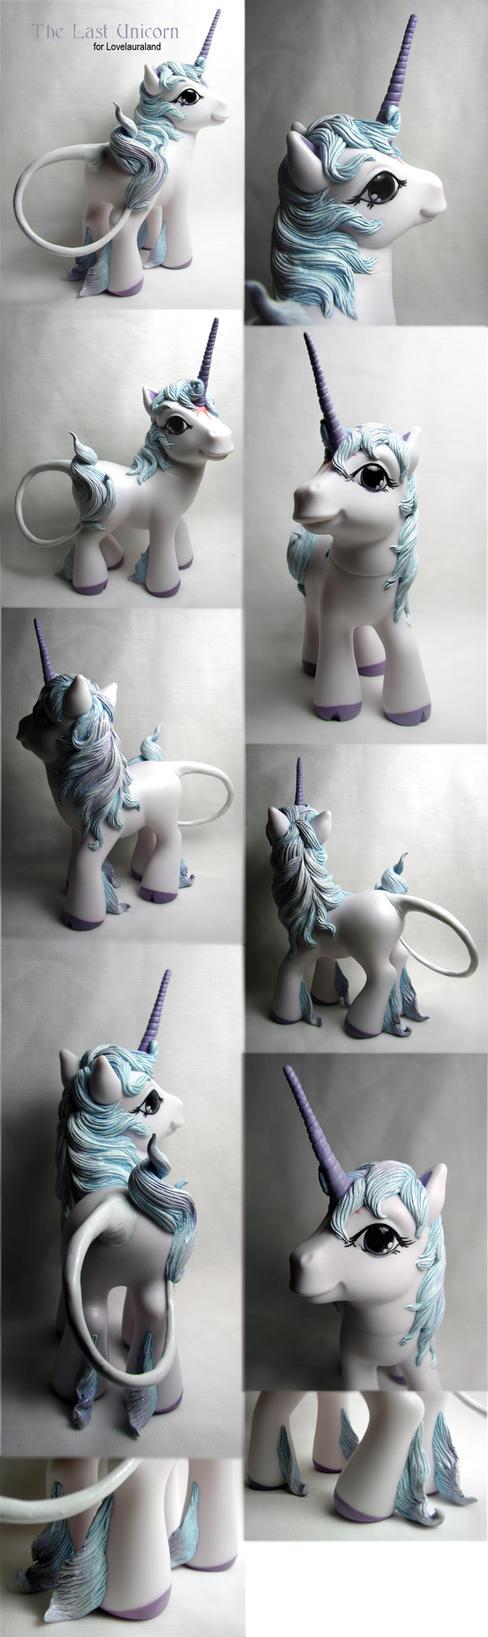 Last Unicorn v.2 by Woosie